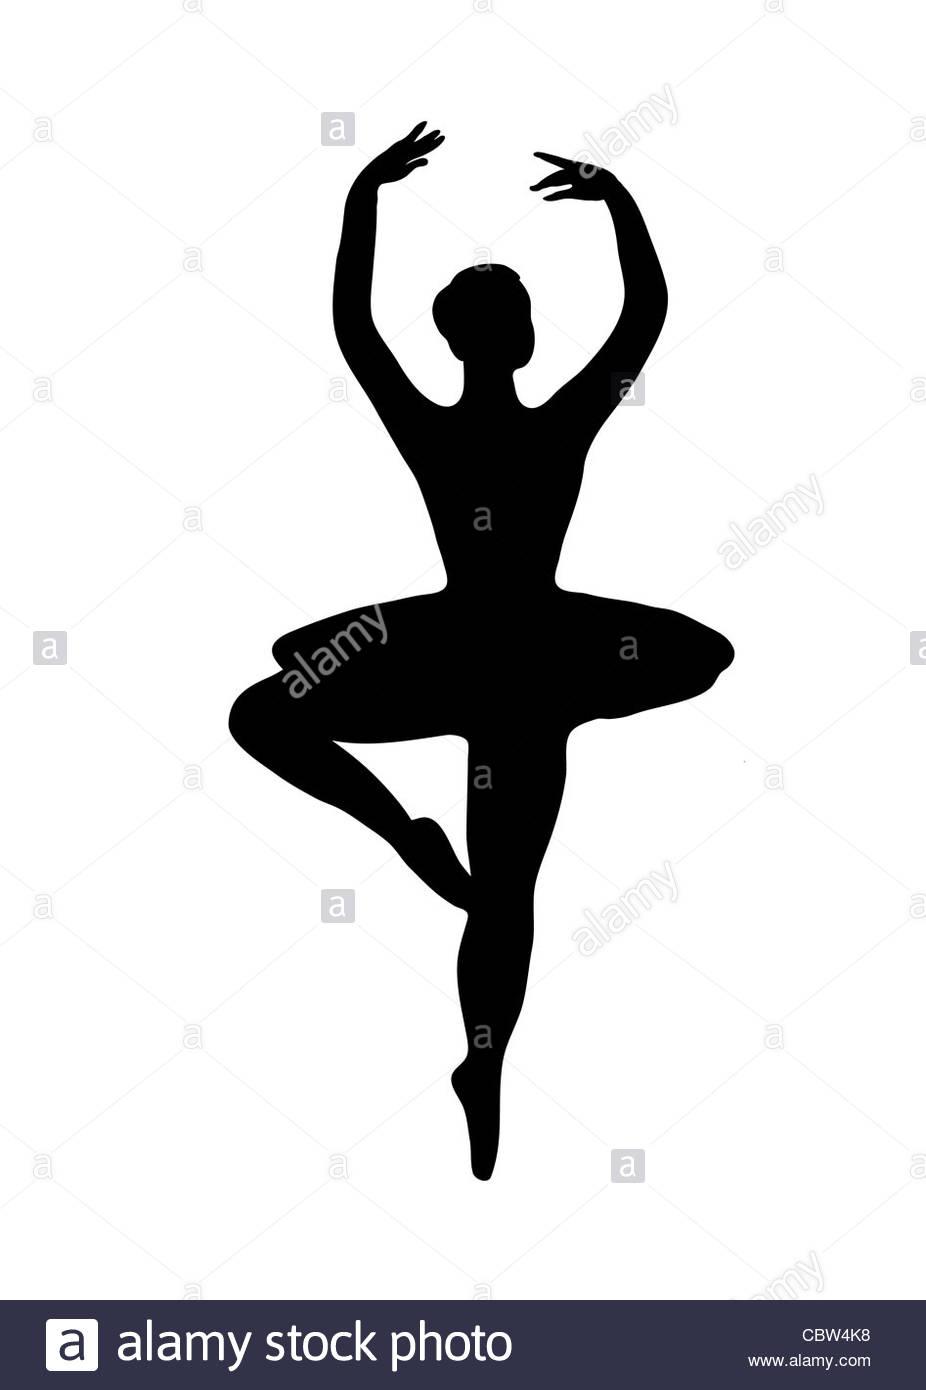 926x1390 Ballet Dance Pose Bw Illustration Stock Photo, Royalty Free Image